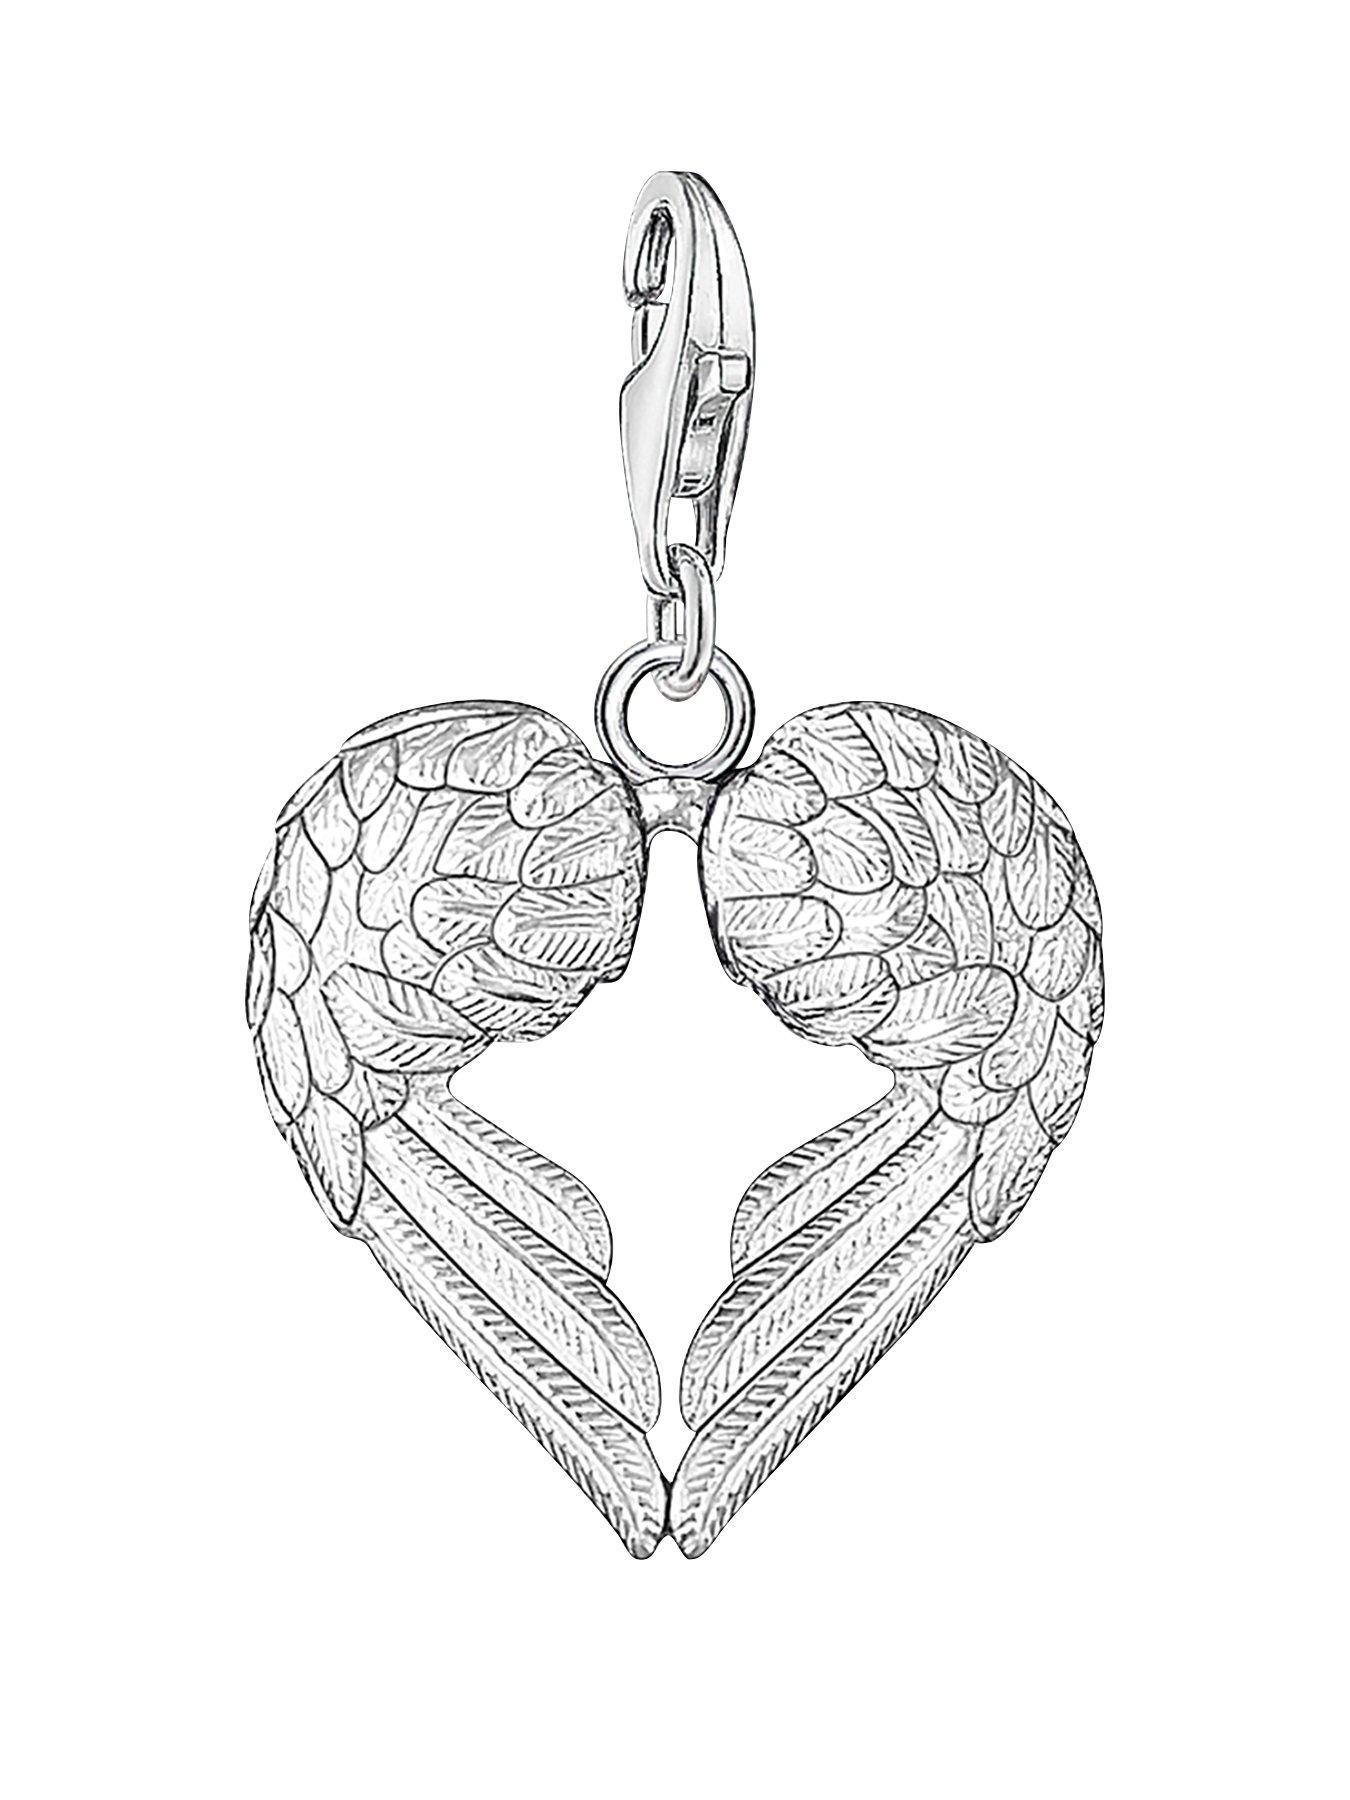 38 UK 5 ANTIQUE SILVER SON HEART CHARM~PENDANT~EMBELLISHMENT~WINE GLASS CHARM